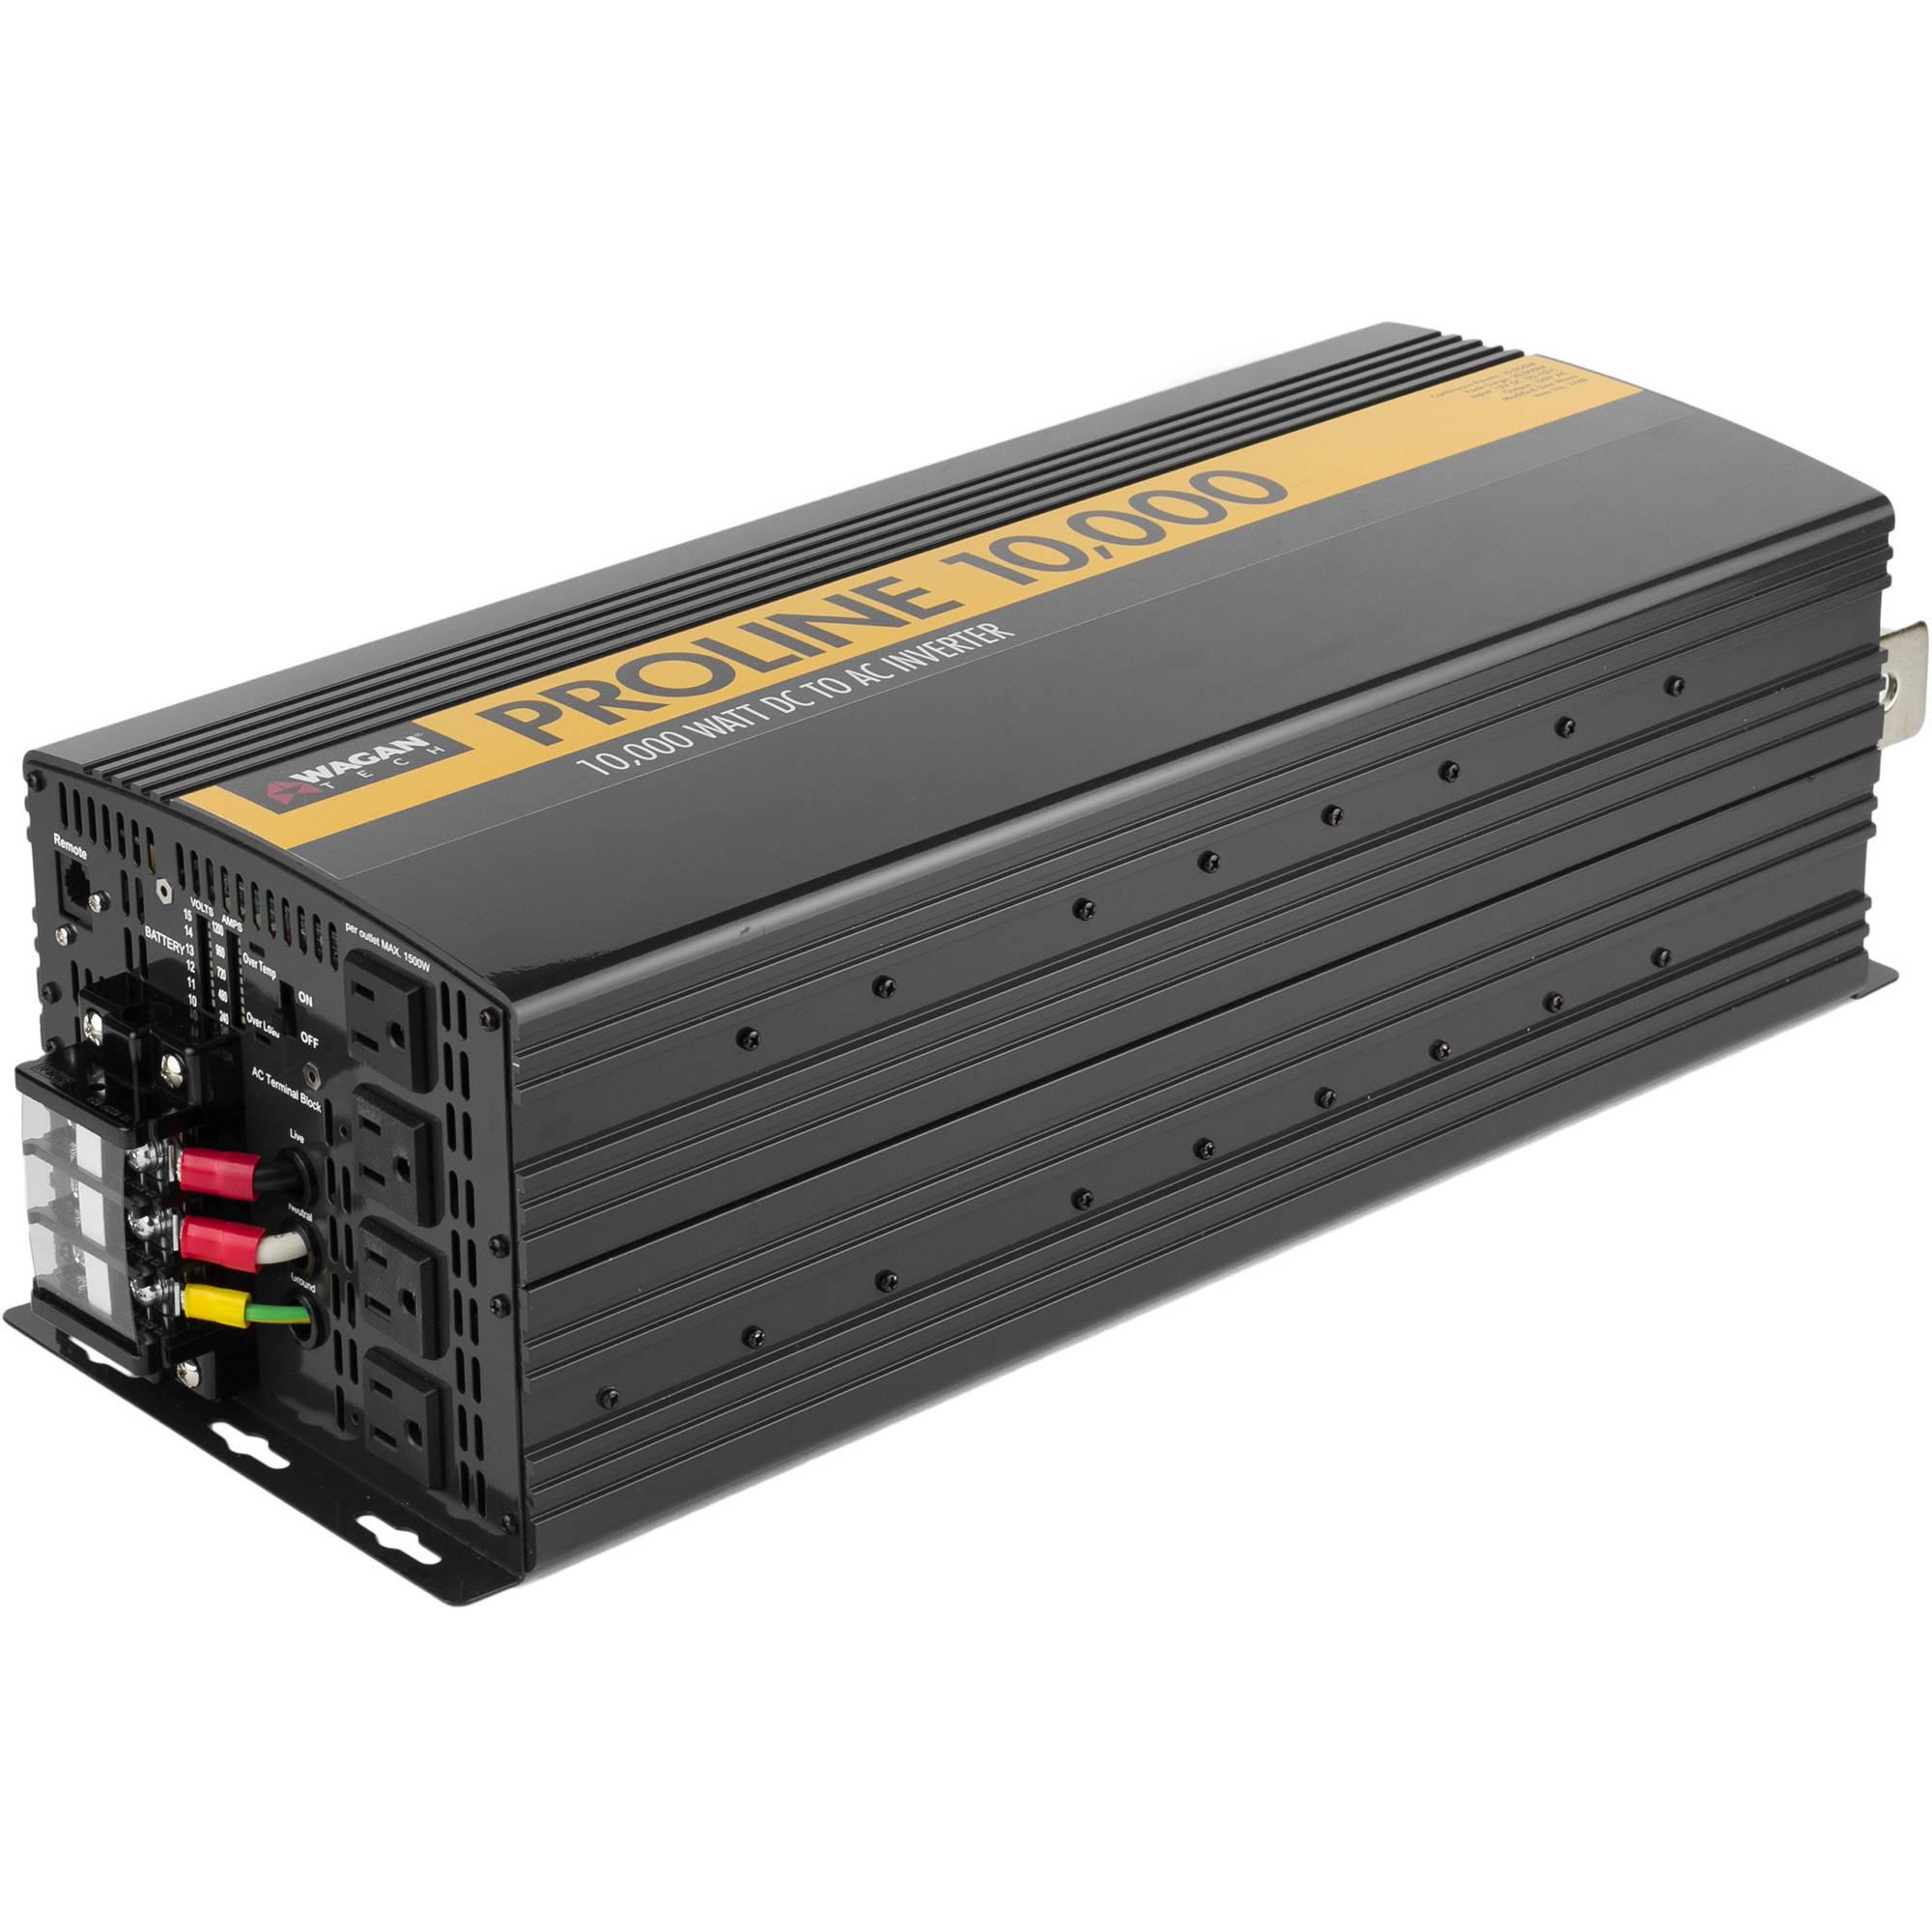 Wagan 10,000 Watt Proline DC to AC Power Inverter plus Remote